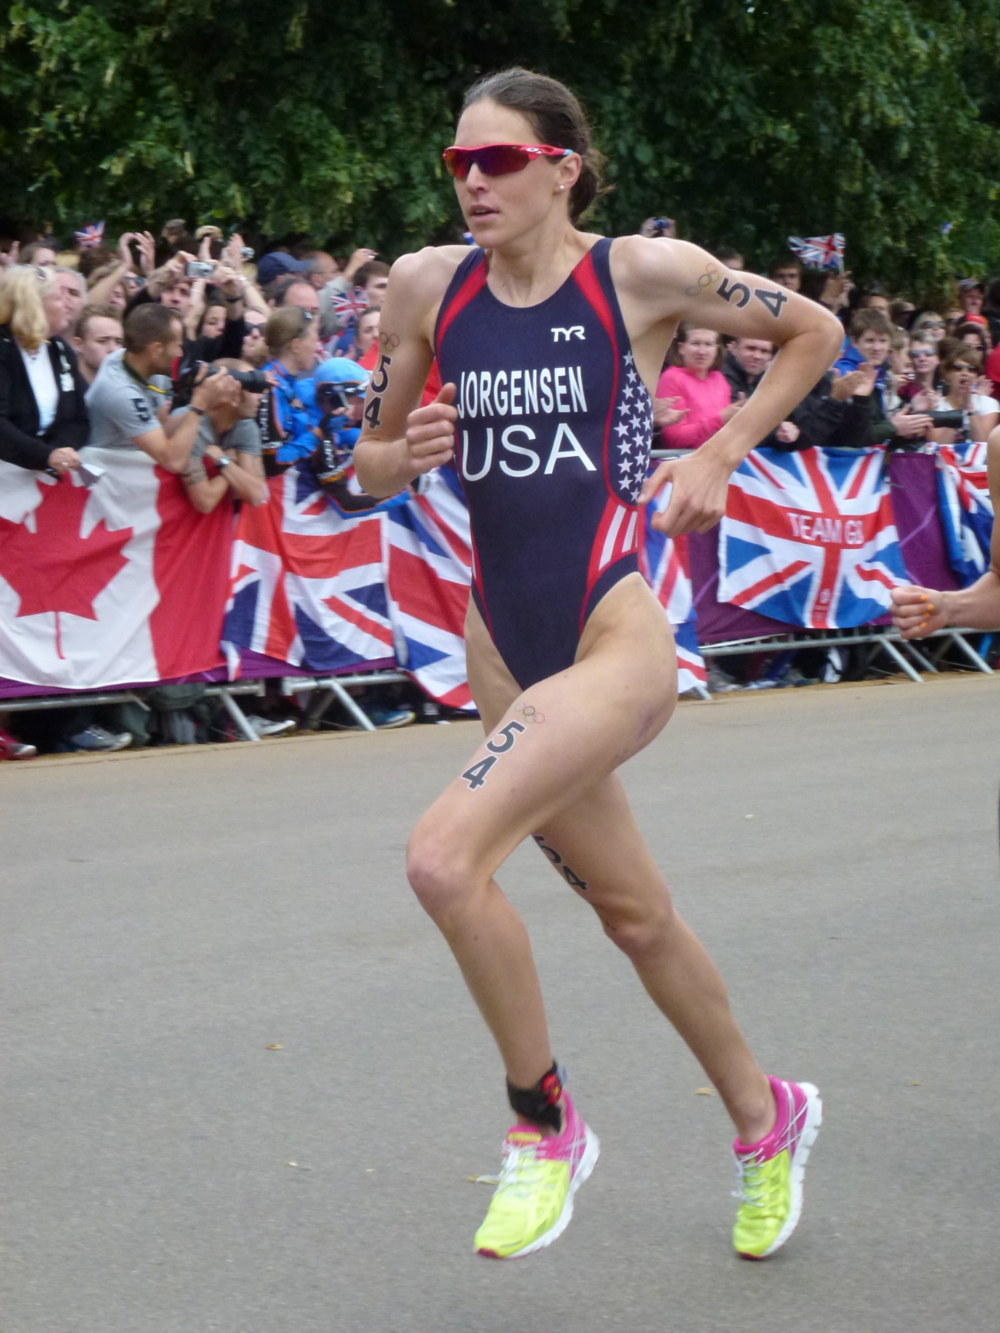 GWEN JORGENSEN 2012 US Olympian